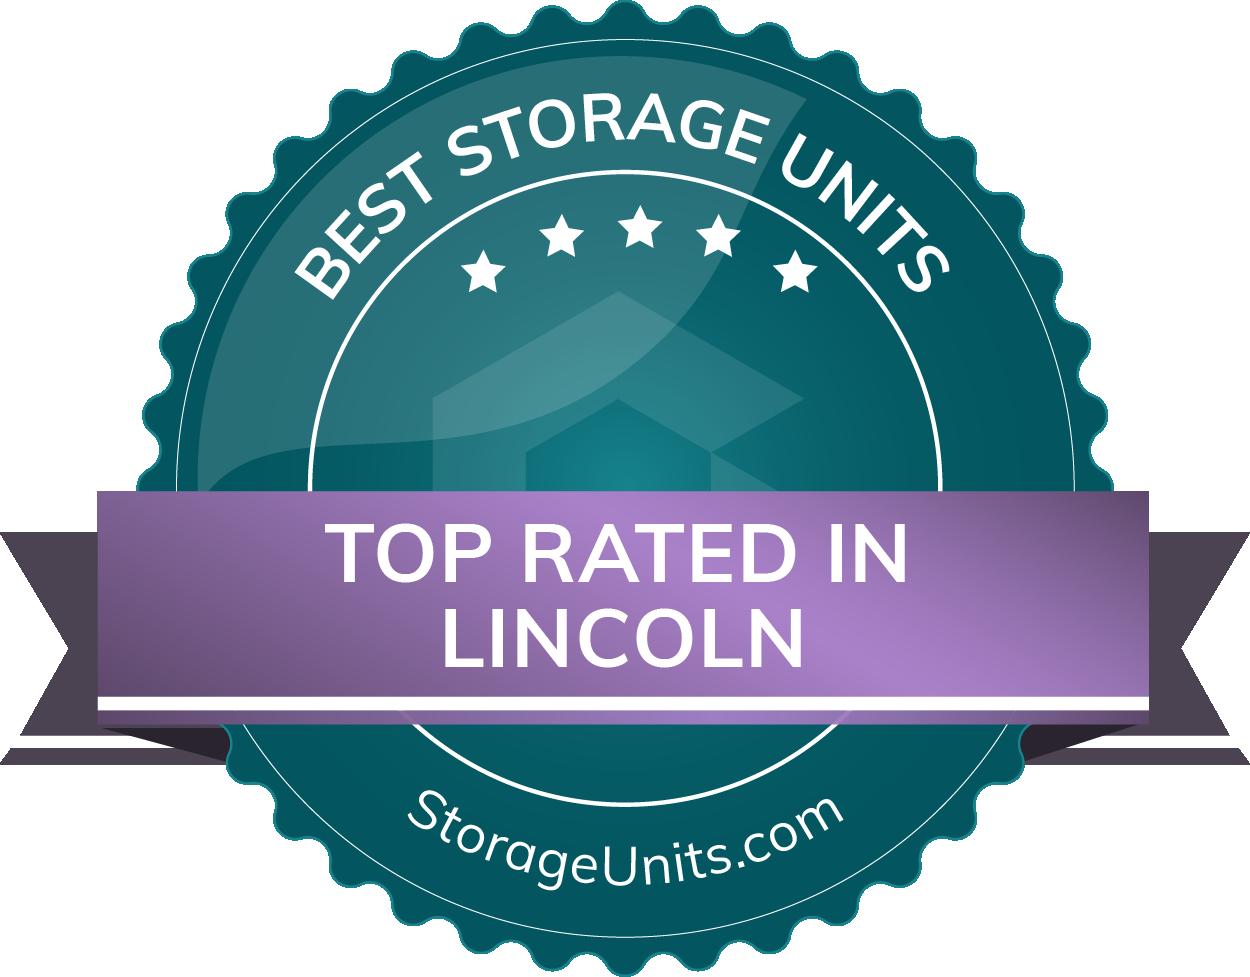 Best Self Storage Units in Lincoln, NE